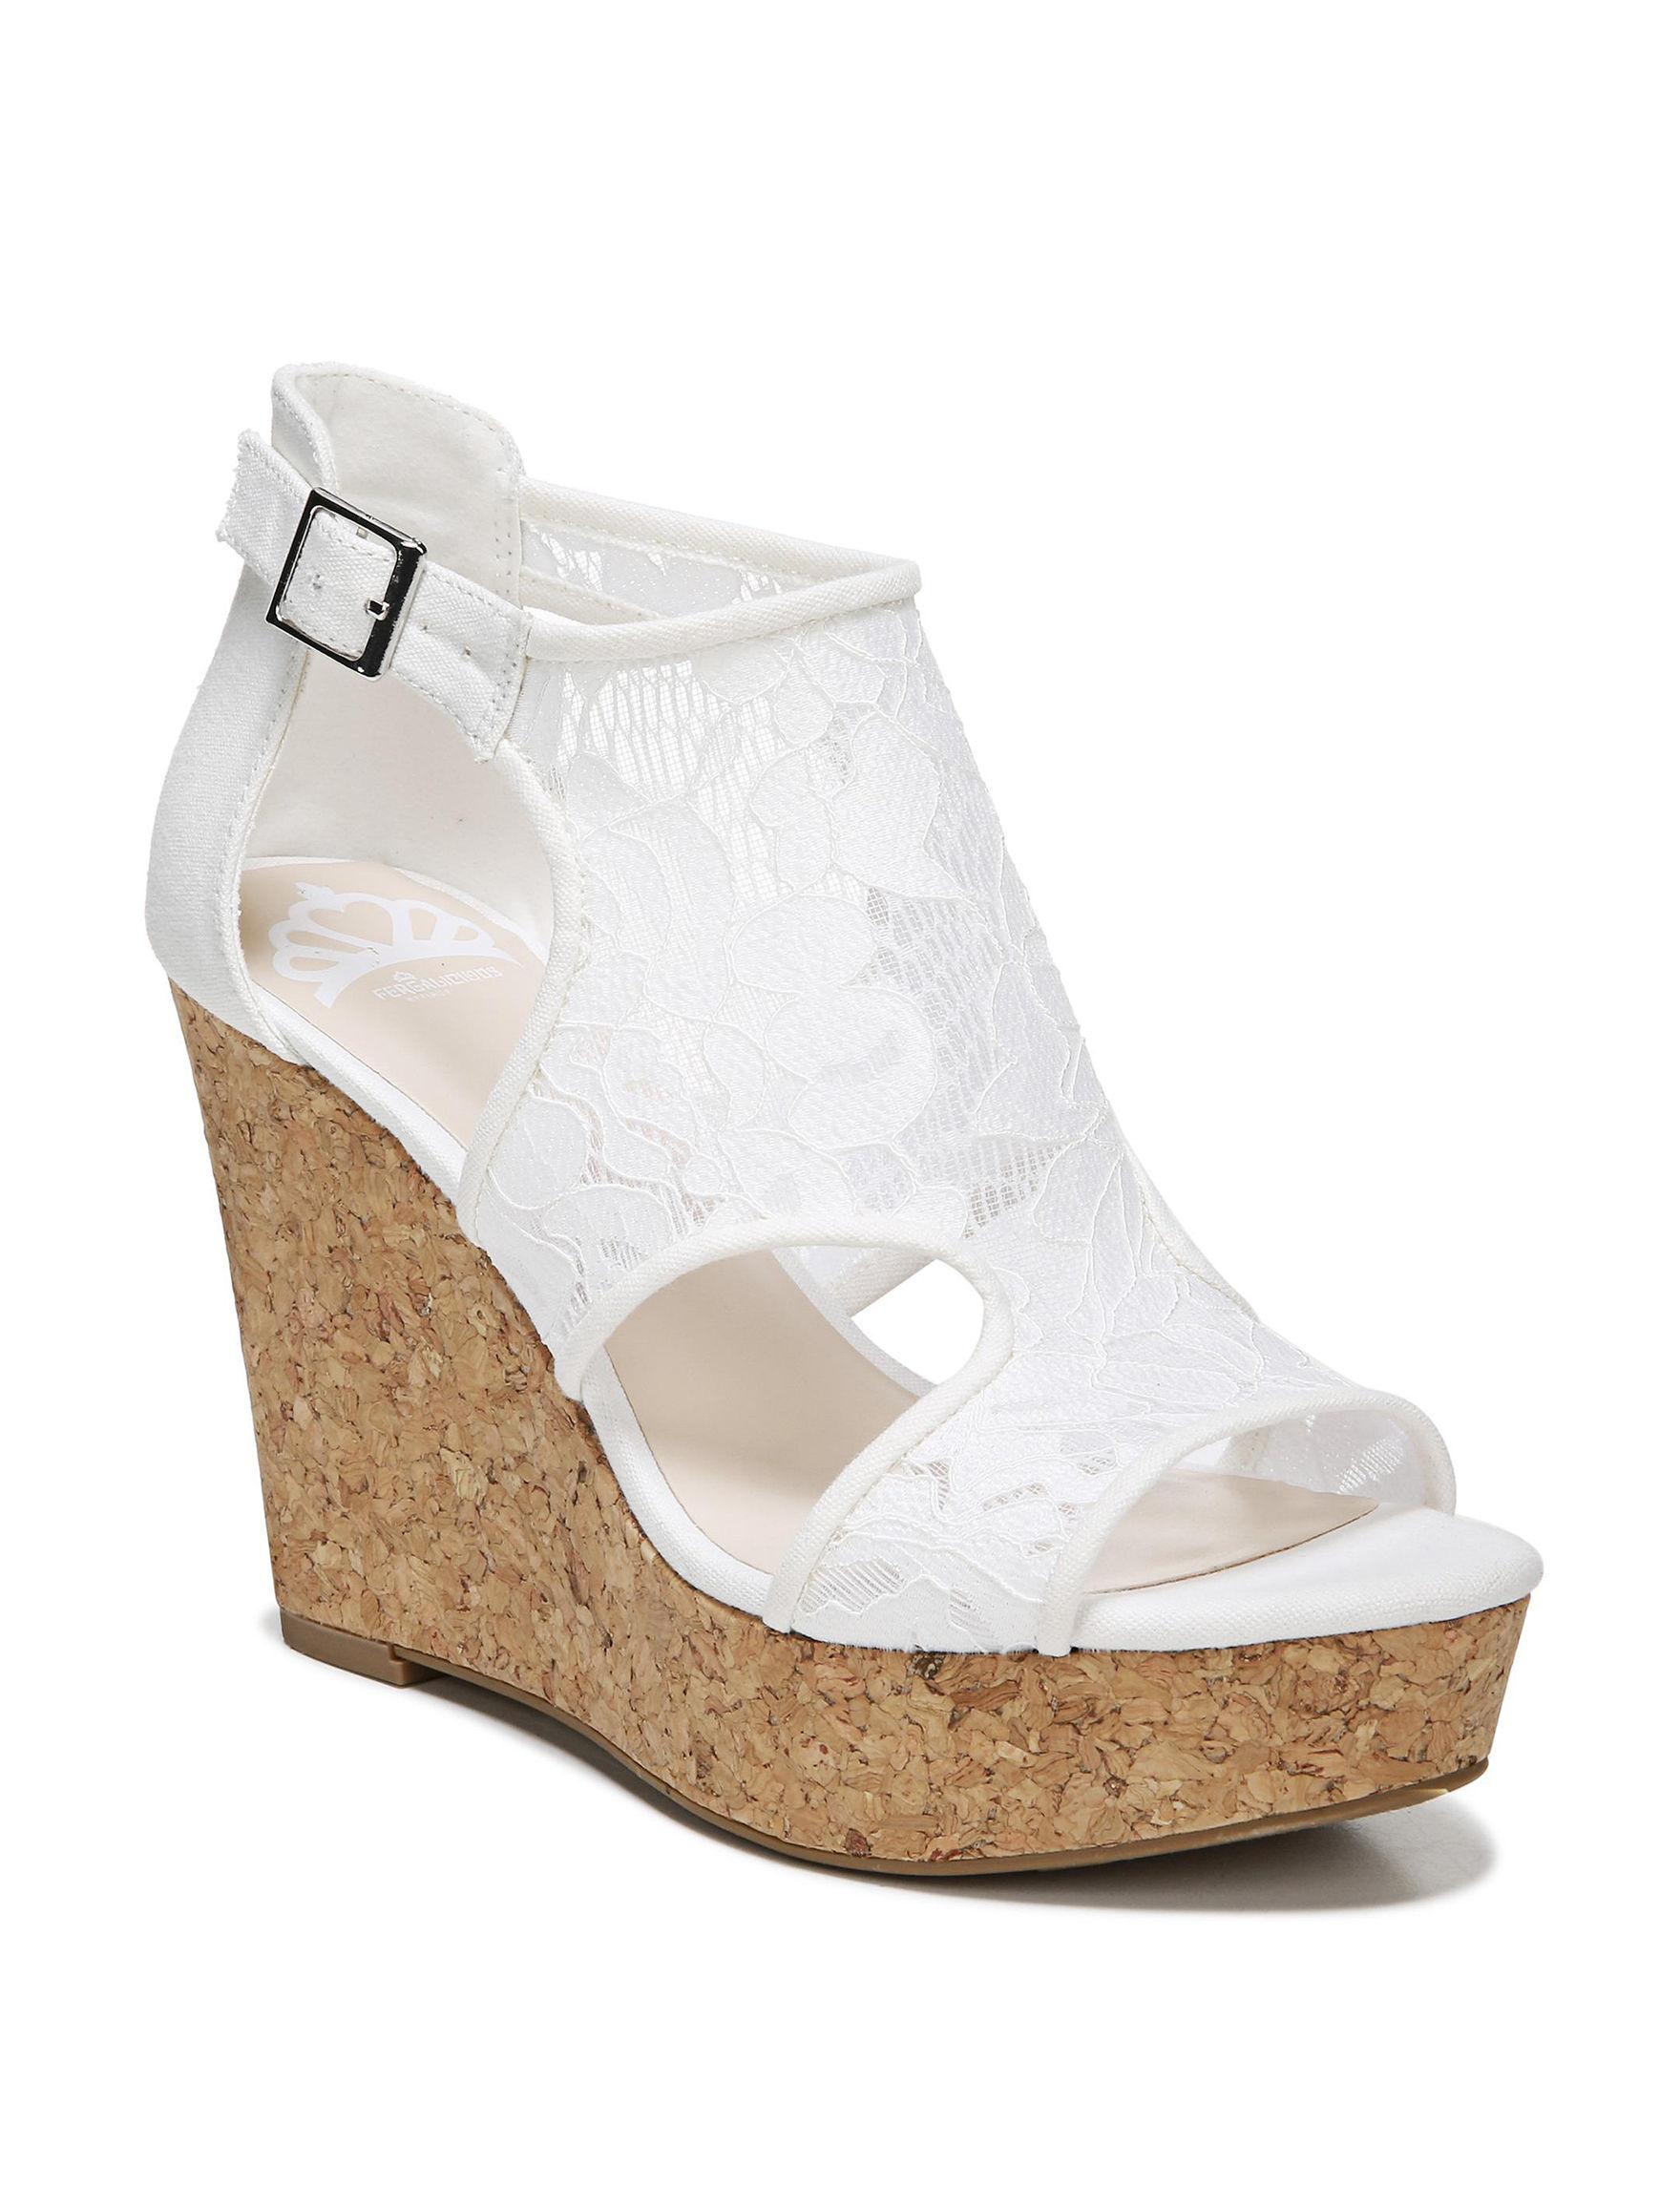 Fergalicious by Fergie White Peep Toe Platform Wedge Sandals